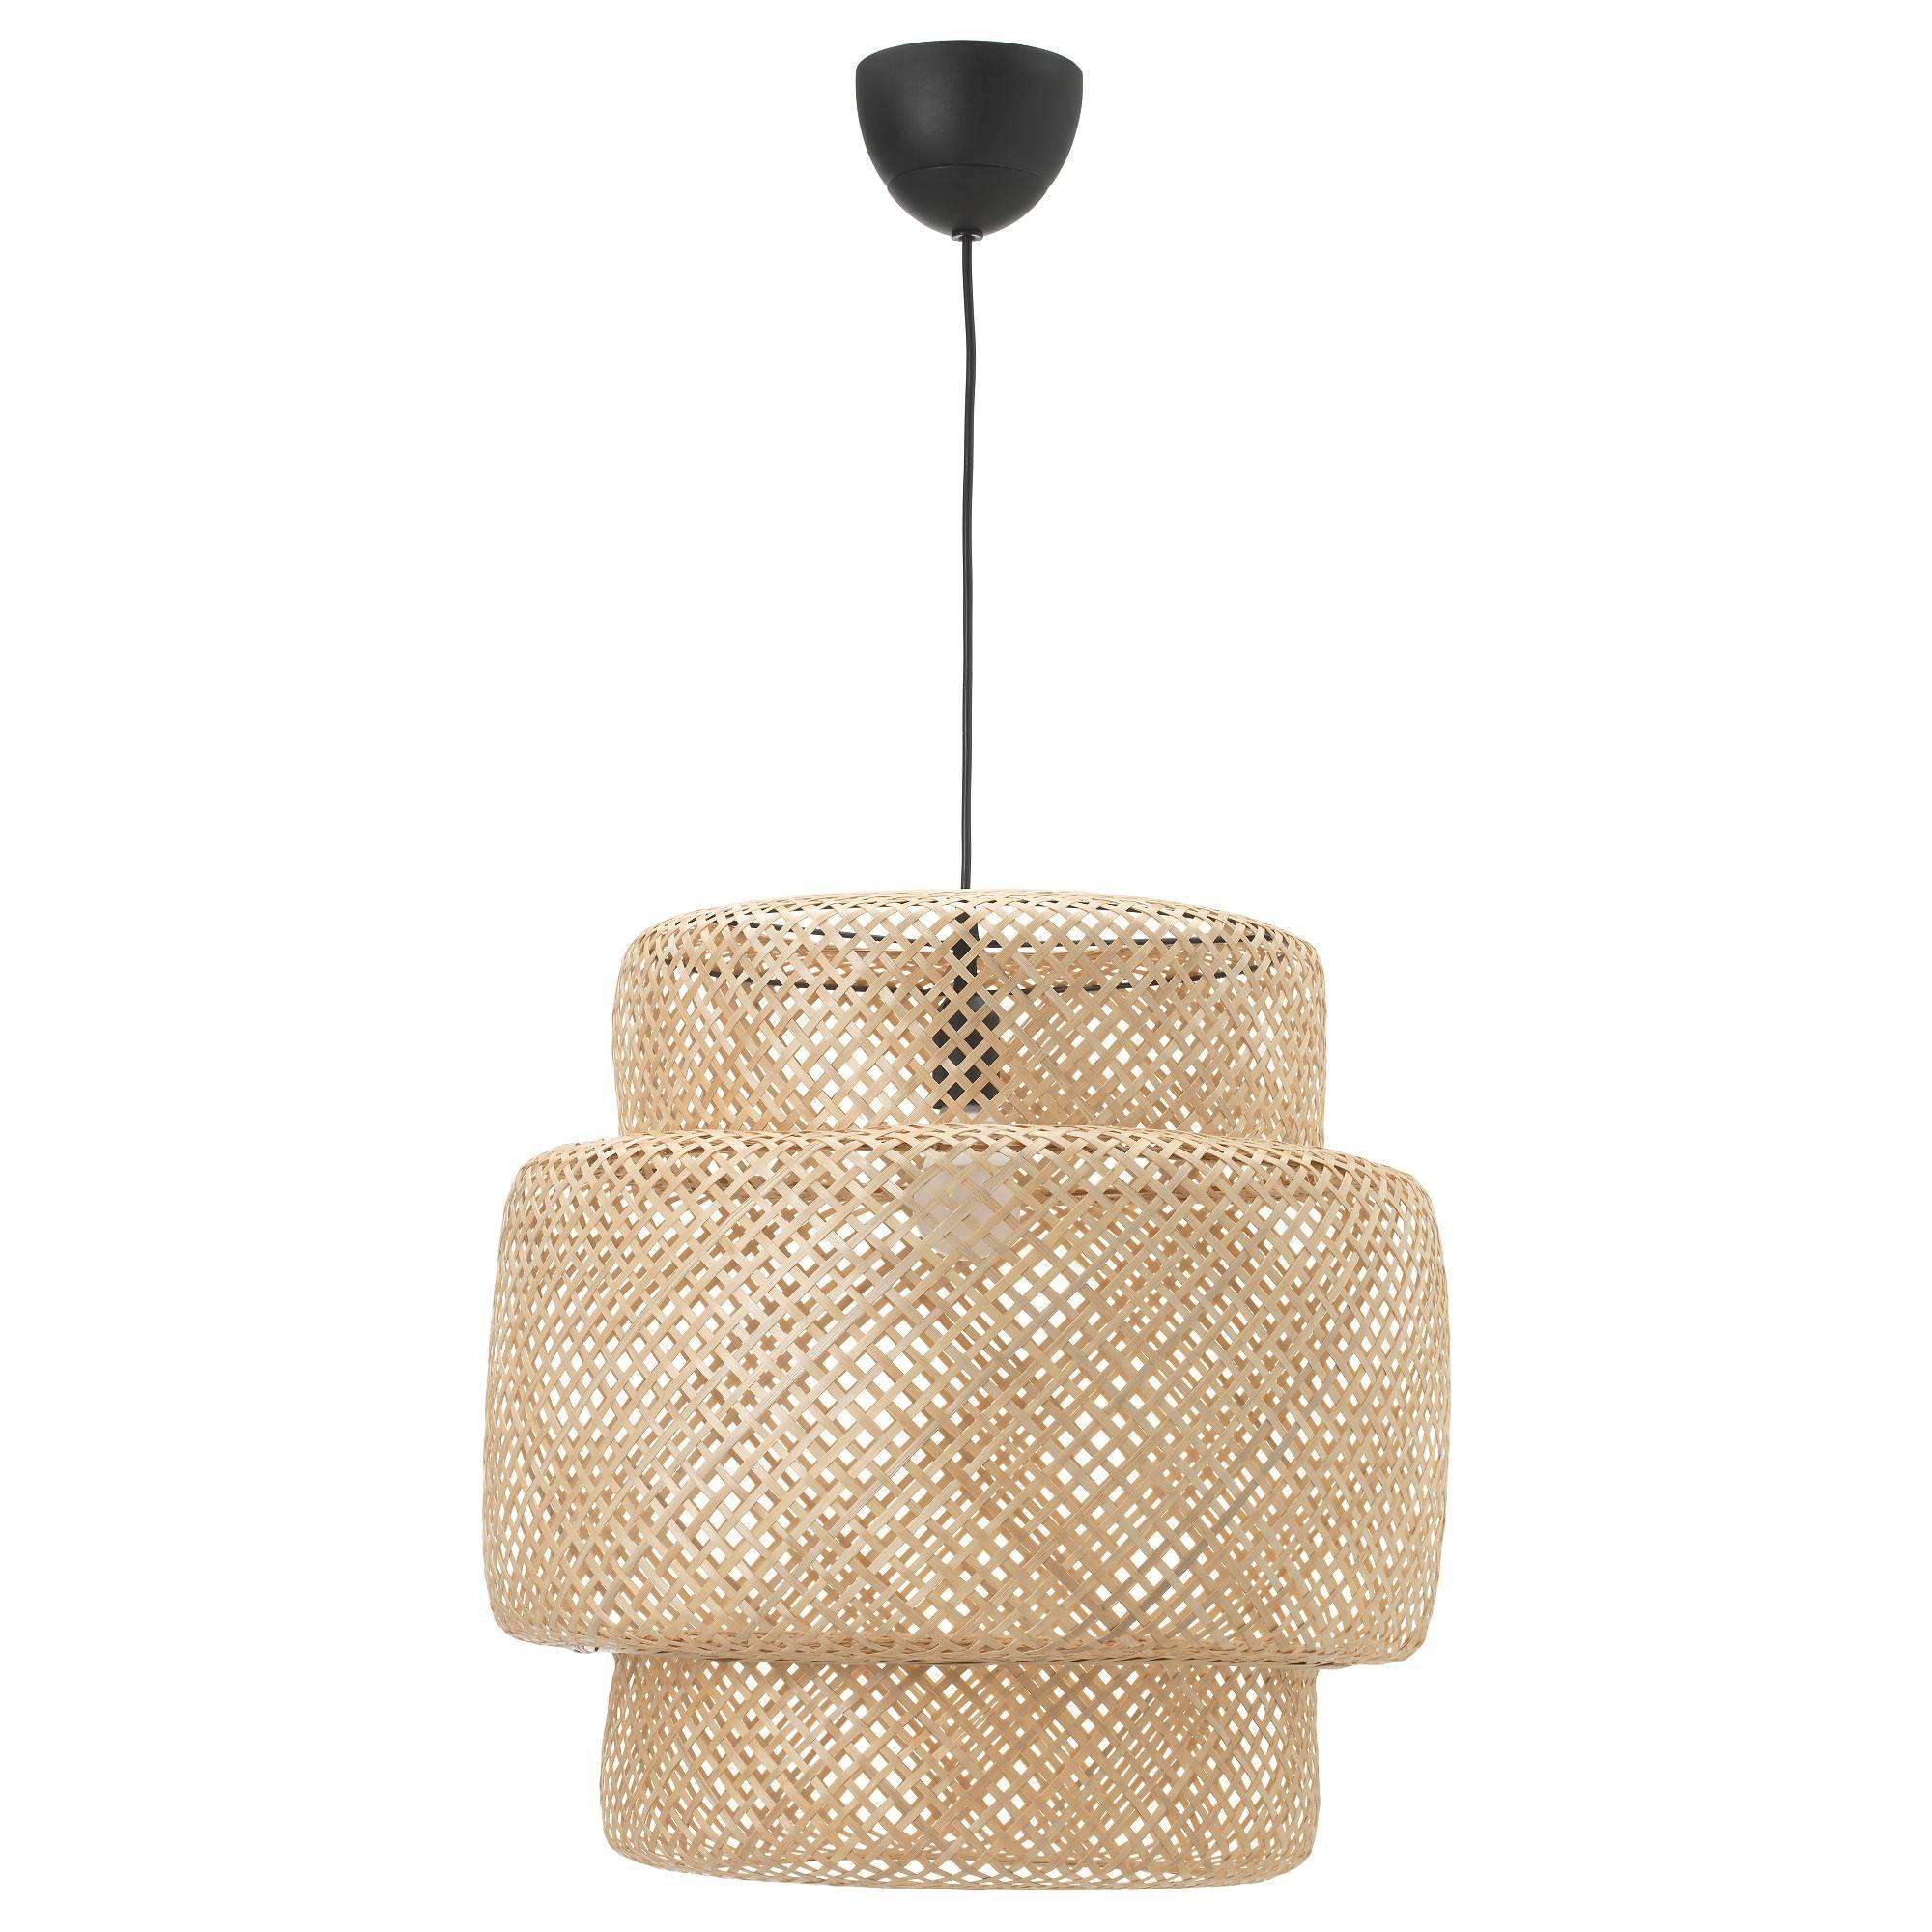 Pendant Lighting | Pendant Lamps & Chandeliers | Ikea With Regard To Ikea Lighting Pendants (View 11 of 15)